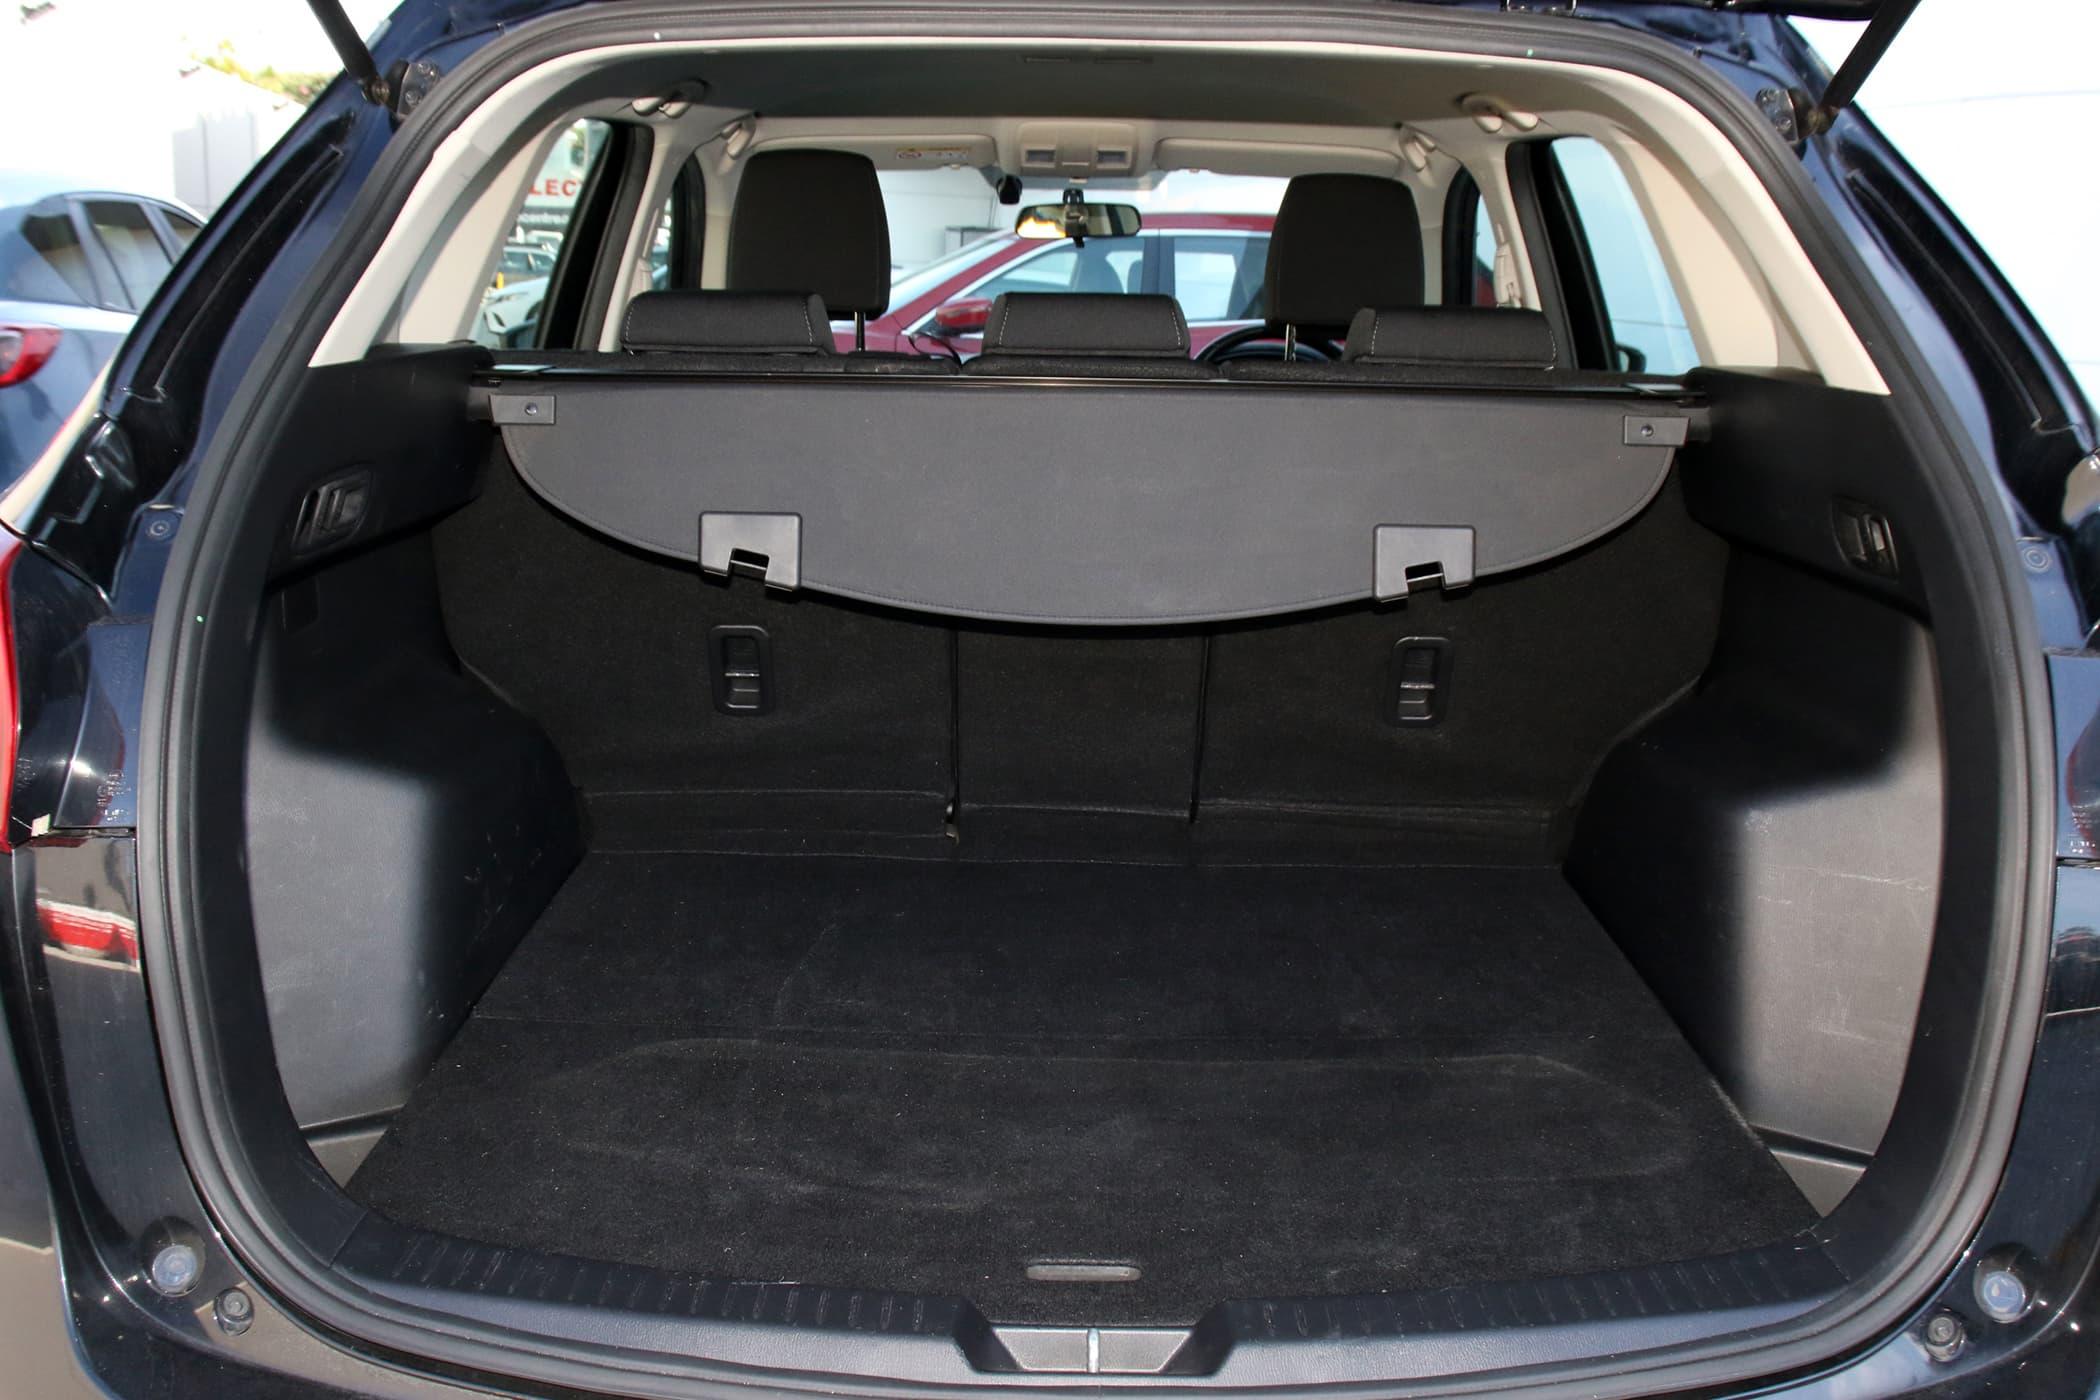 2016 Mazda CX-5 Maxx Sport KE Series 2 Auto - image 10